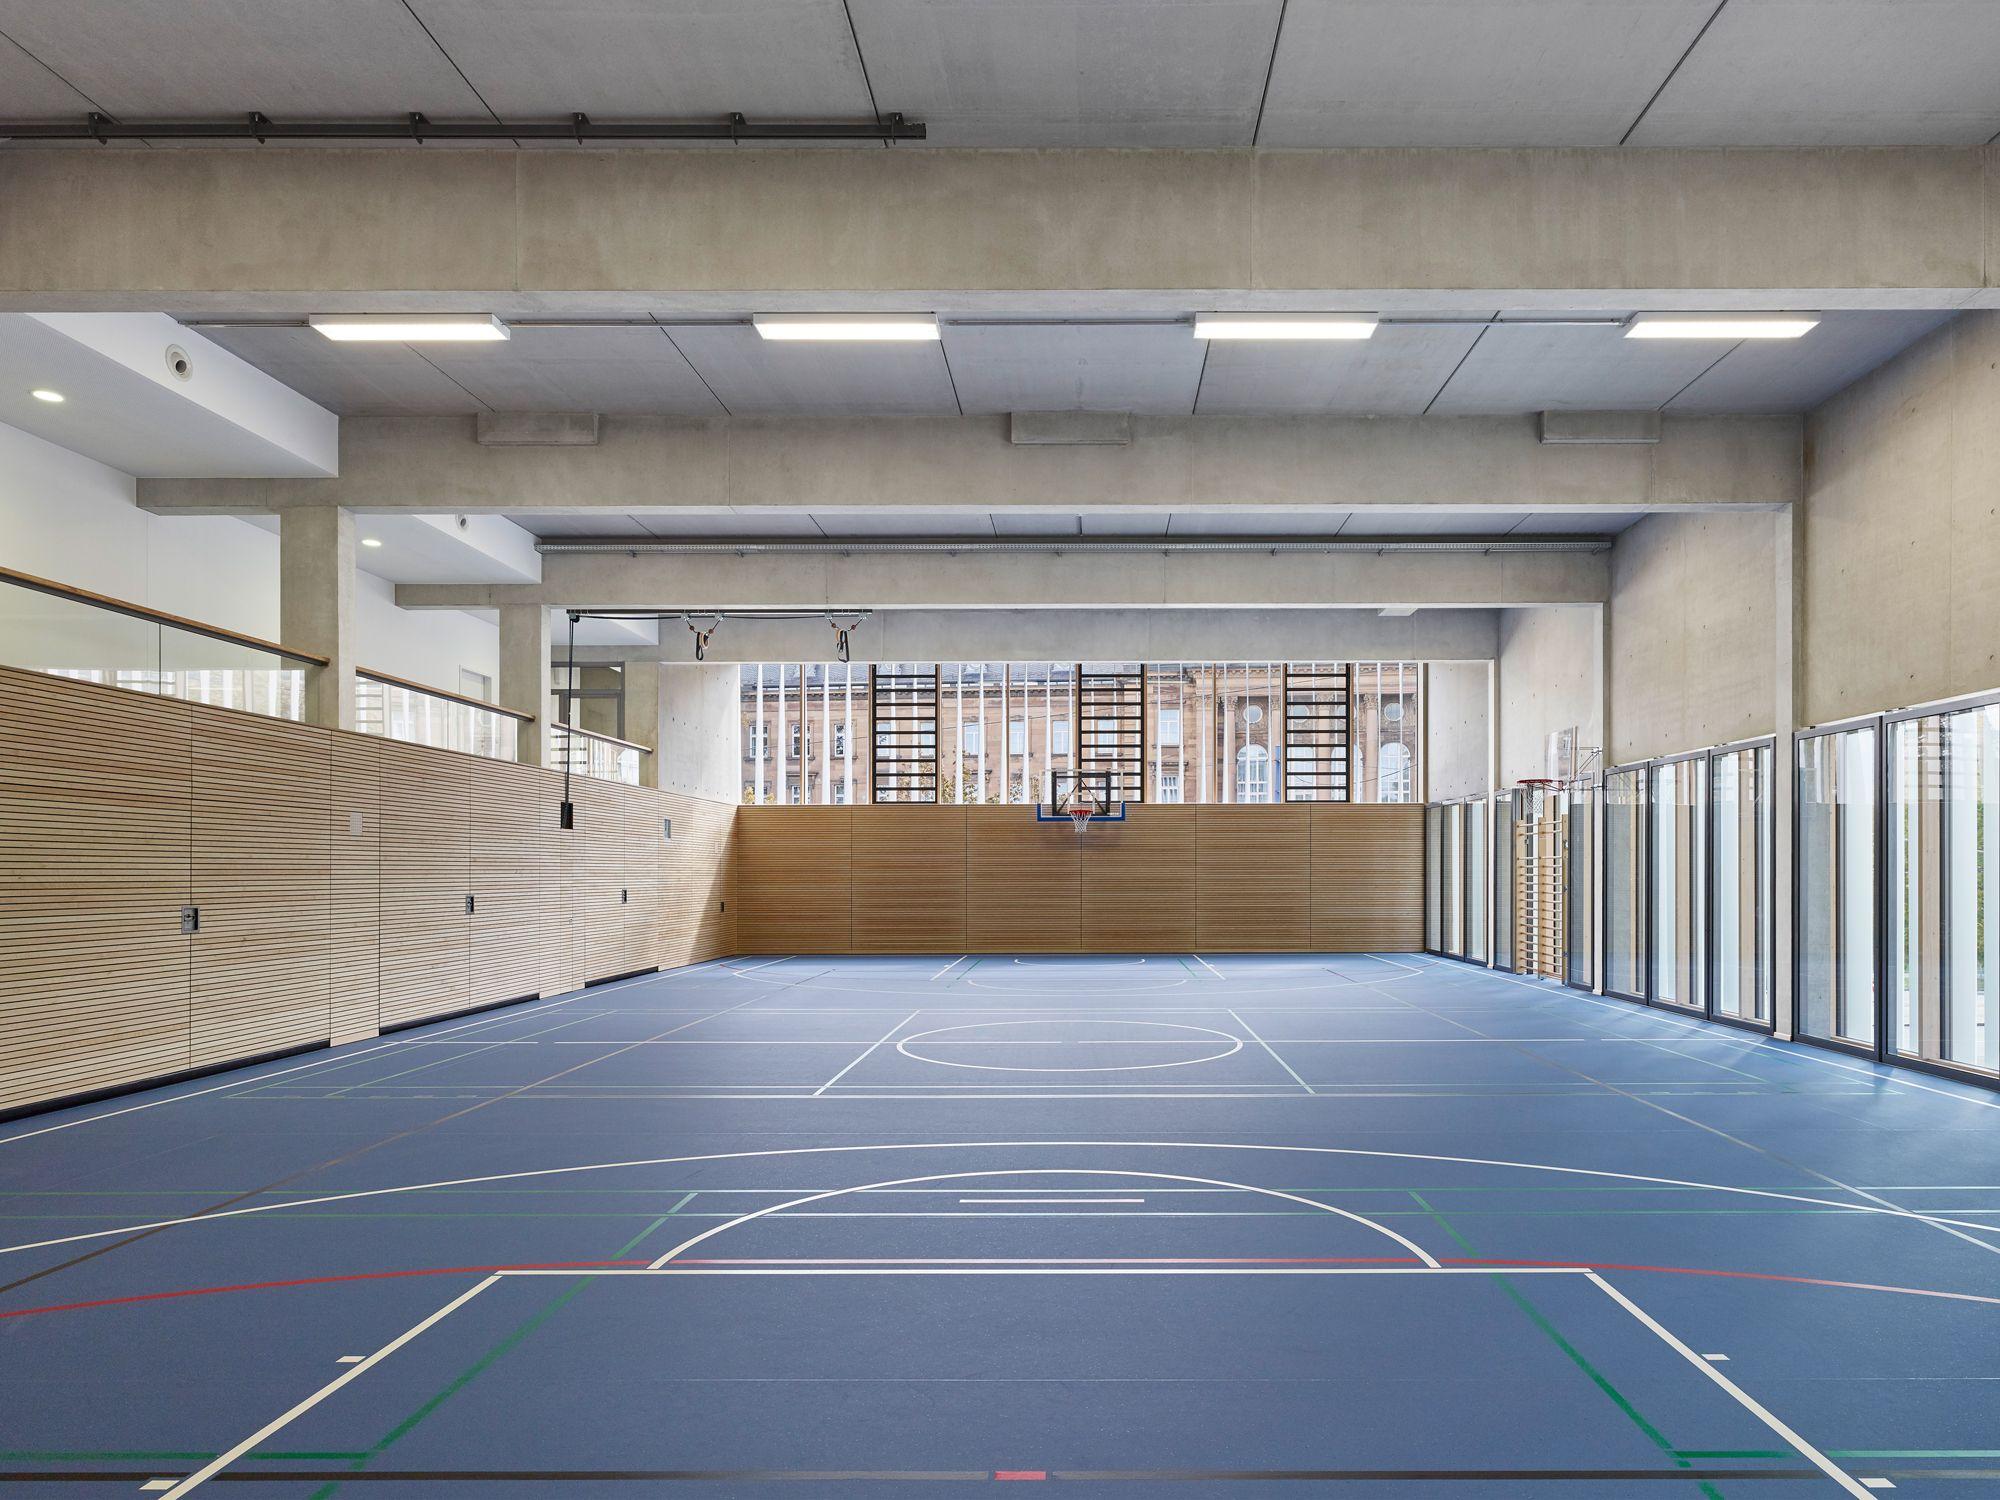 Architekten Ulm wandelbare fassade sporthalle h4a architekten ulm